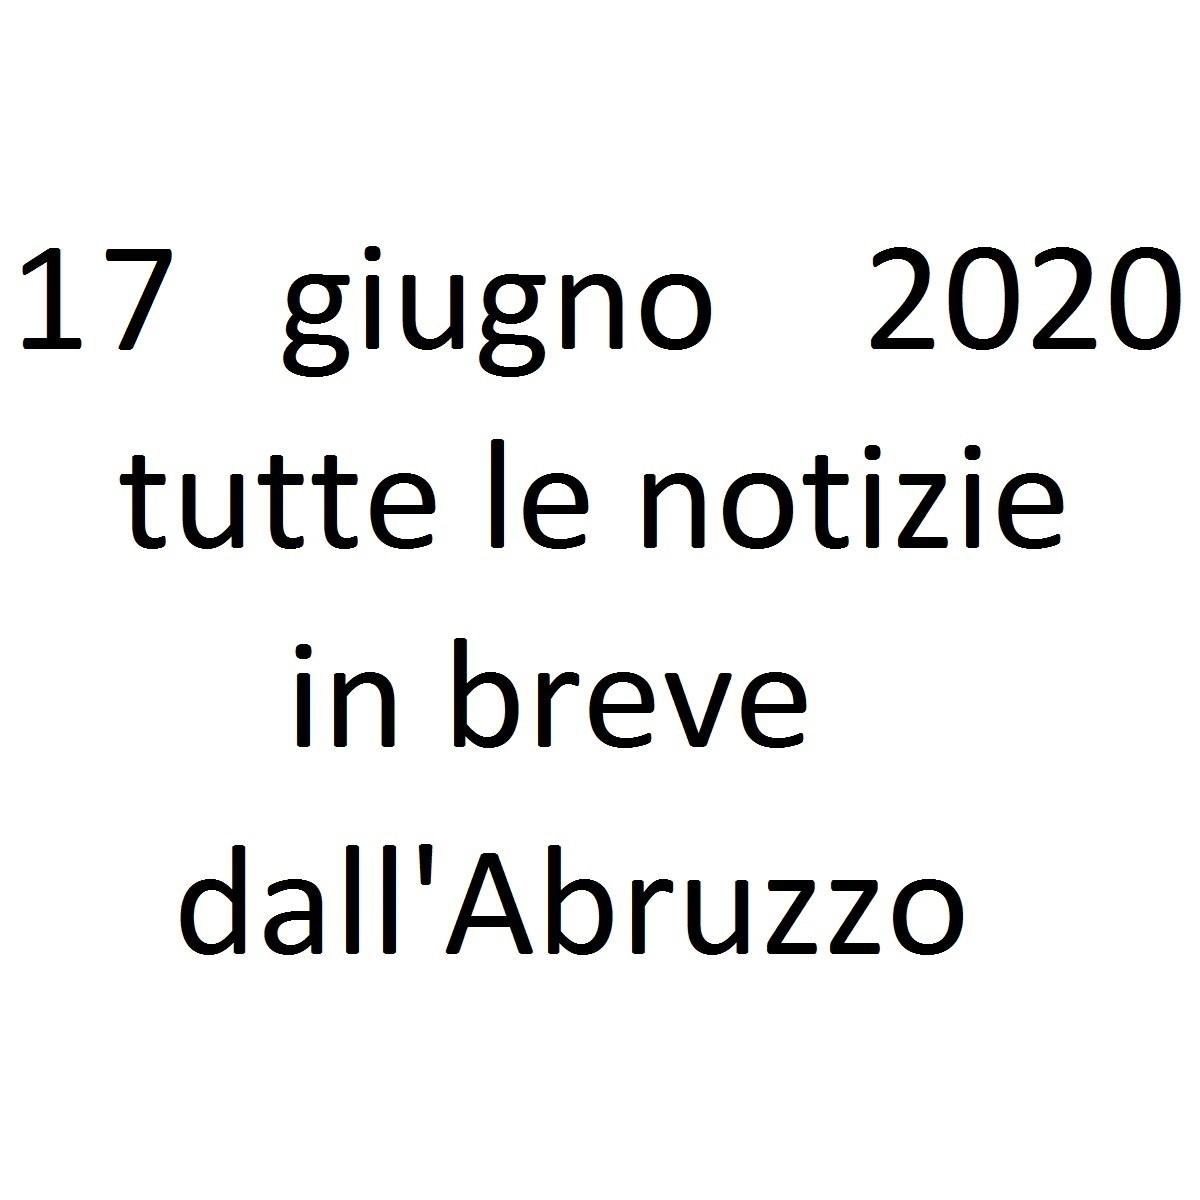 17 giugno 2020 notizie in breve foto